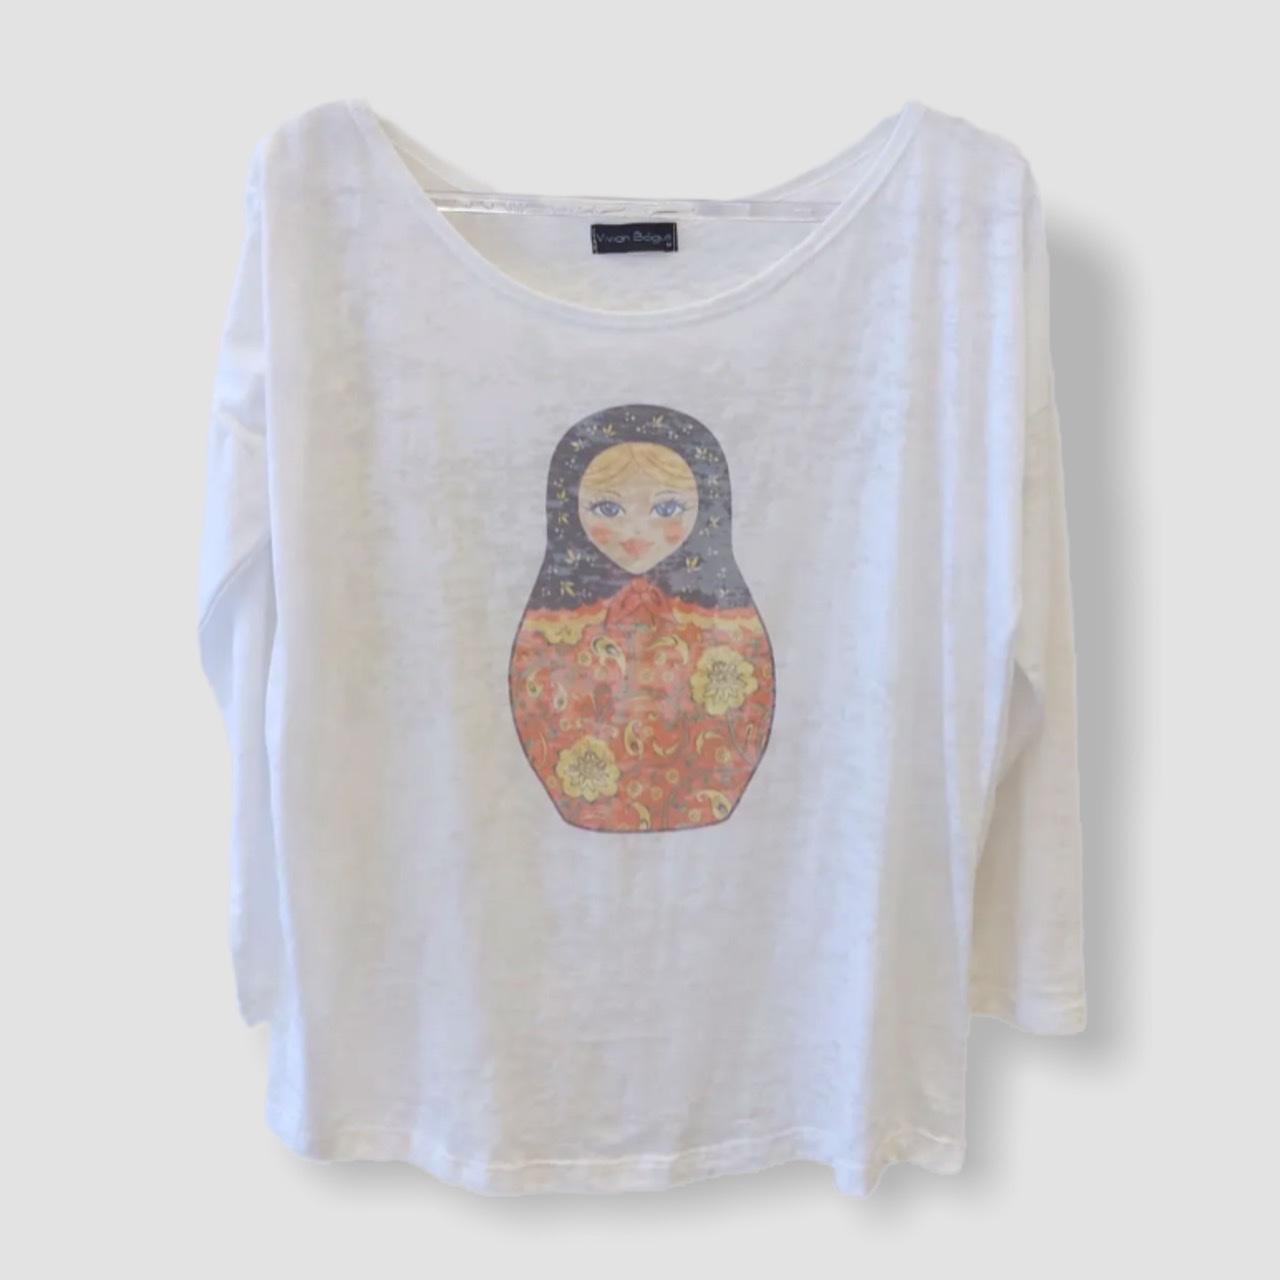 Camiseta devorê manga longa matrioska  - Vivian Bógus